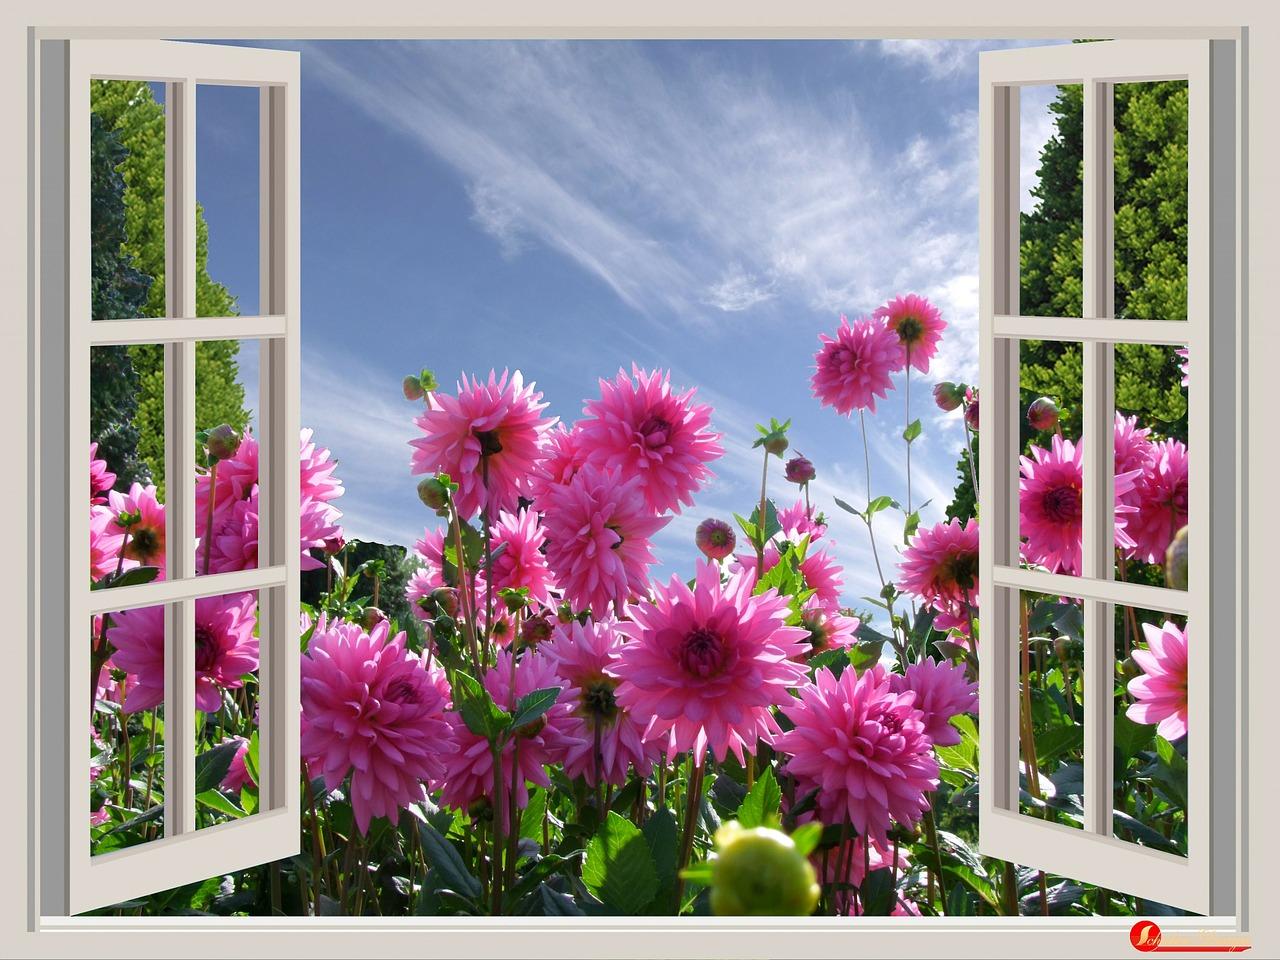 a-beautiful-day-174599_1280